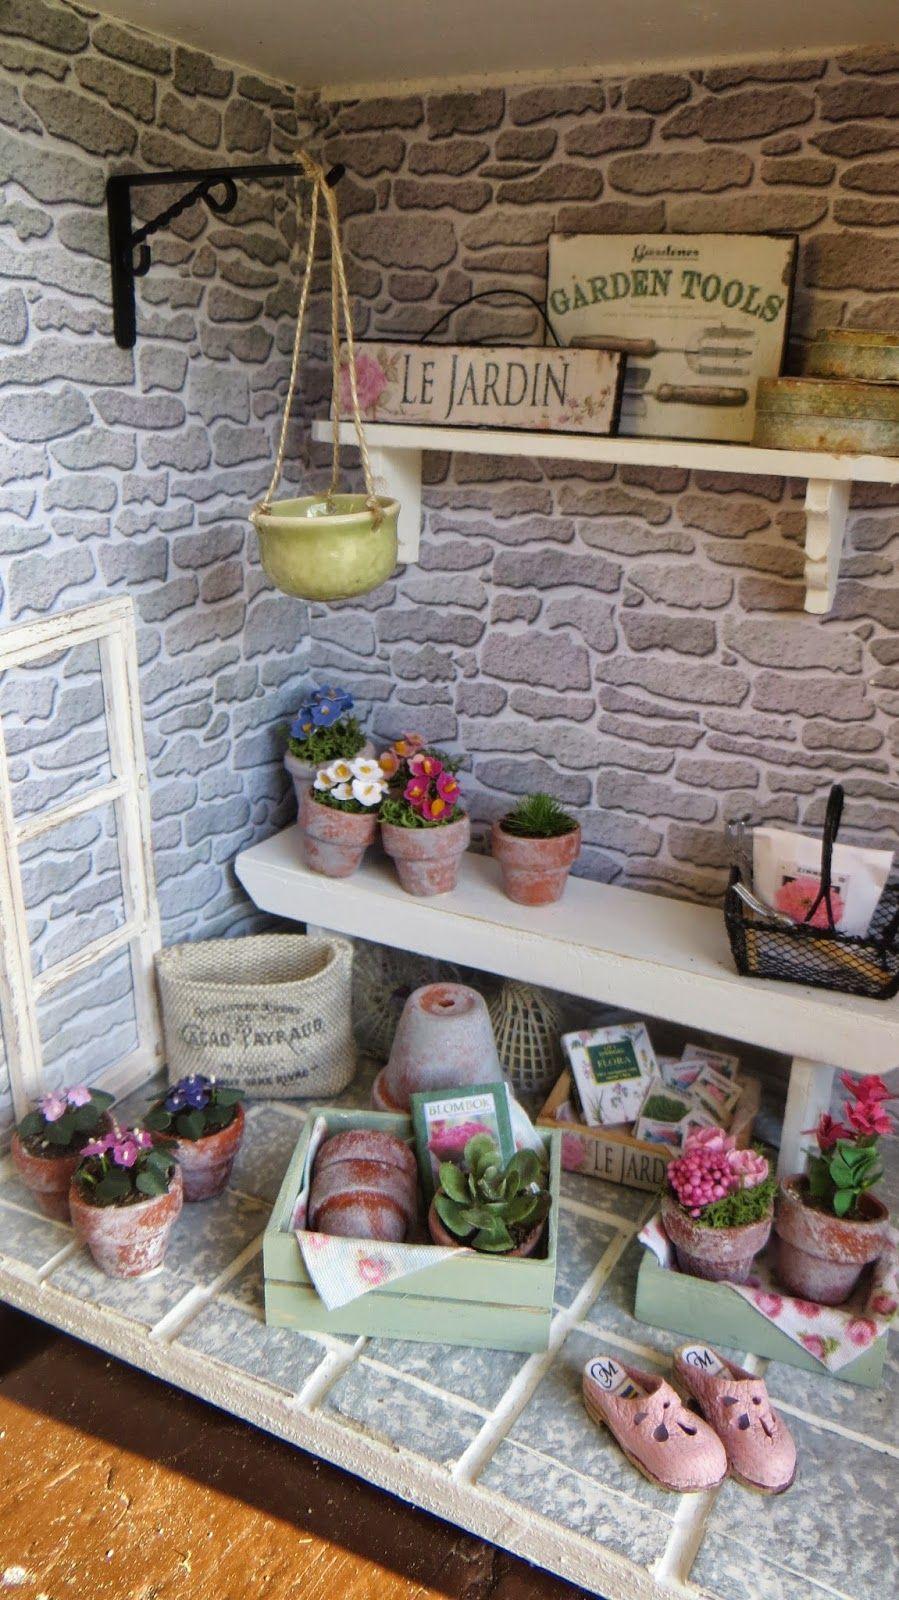 Dollhouse Miniature Garden Hand Tools Set for 1:12 Doll House Scene